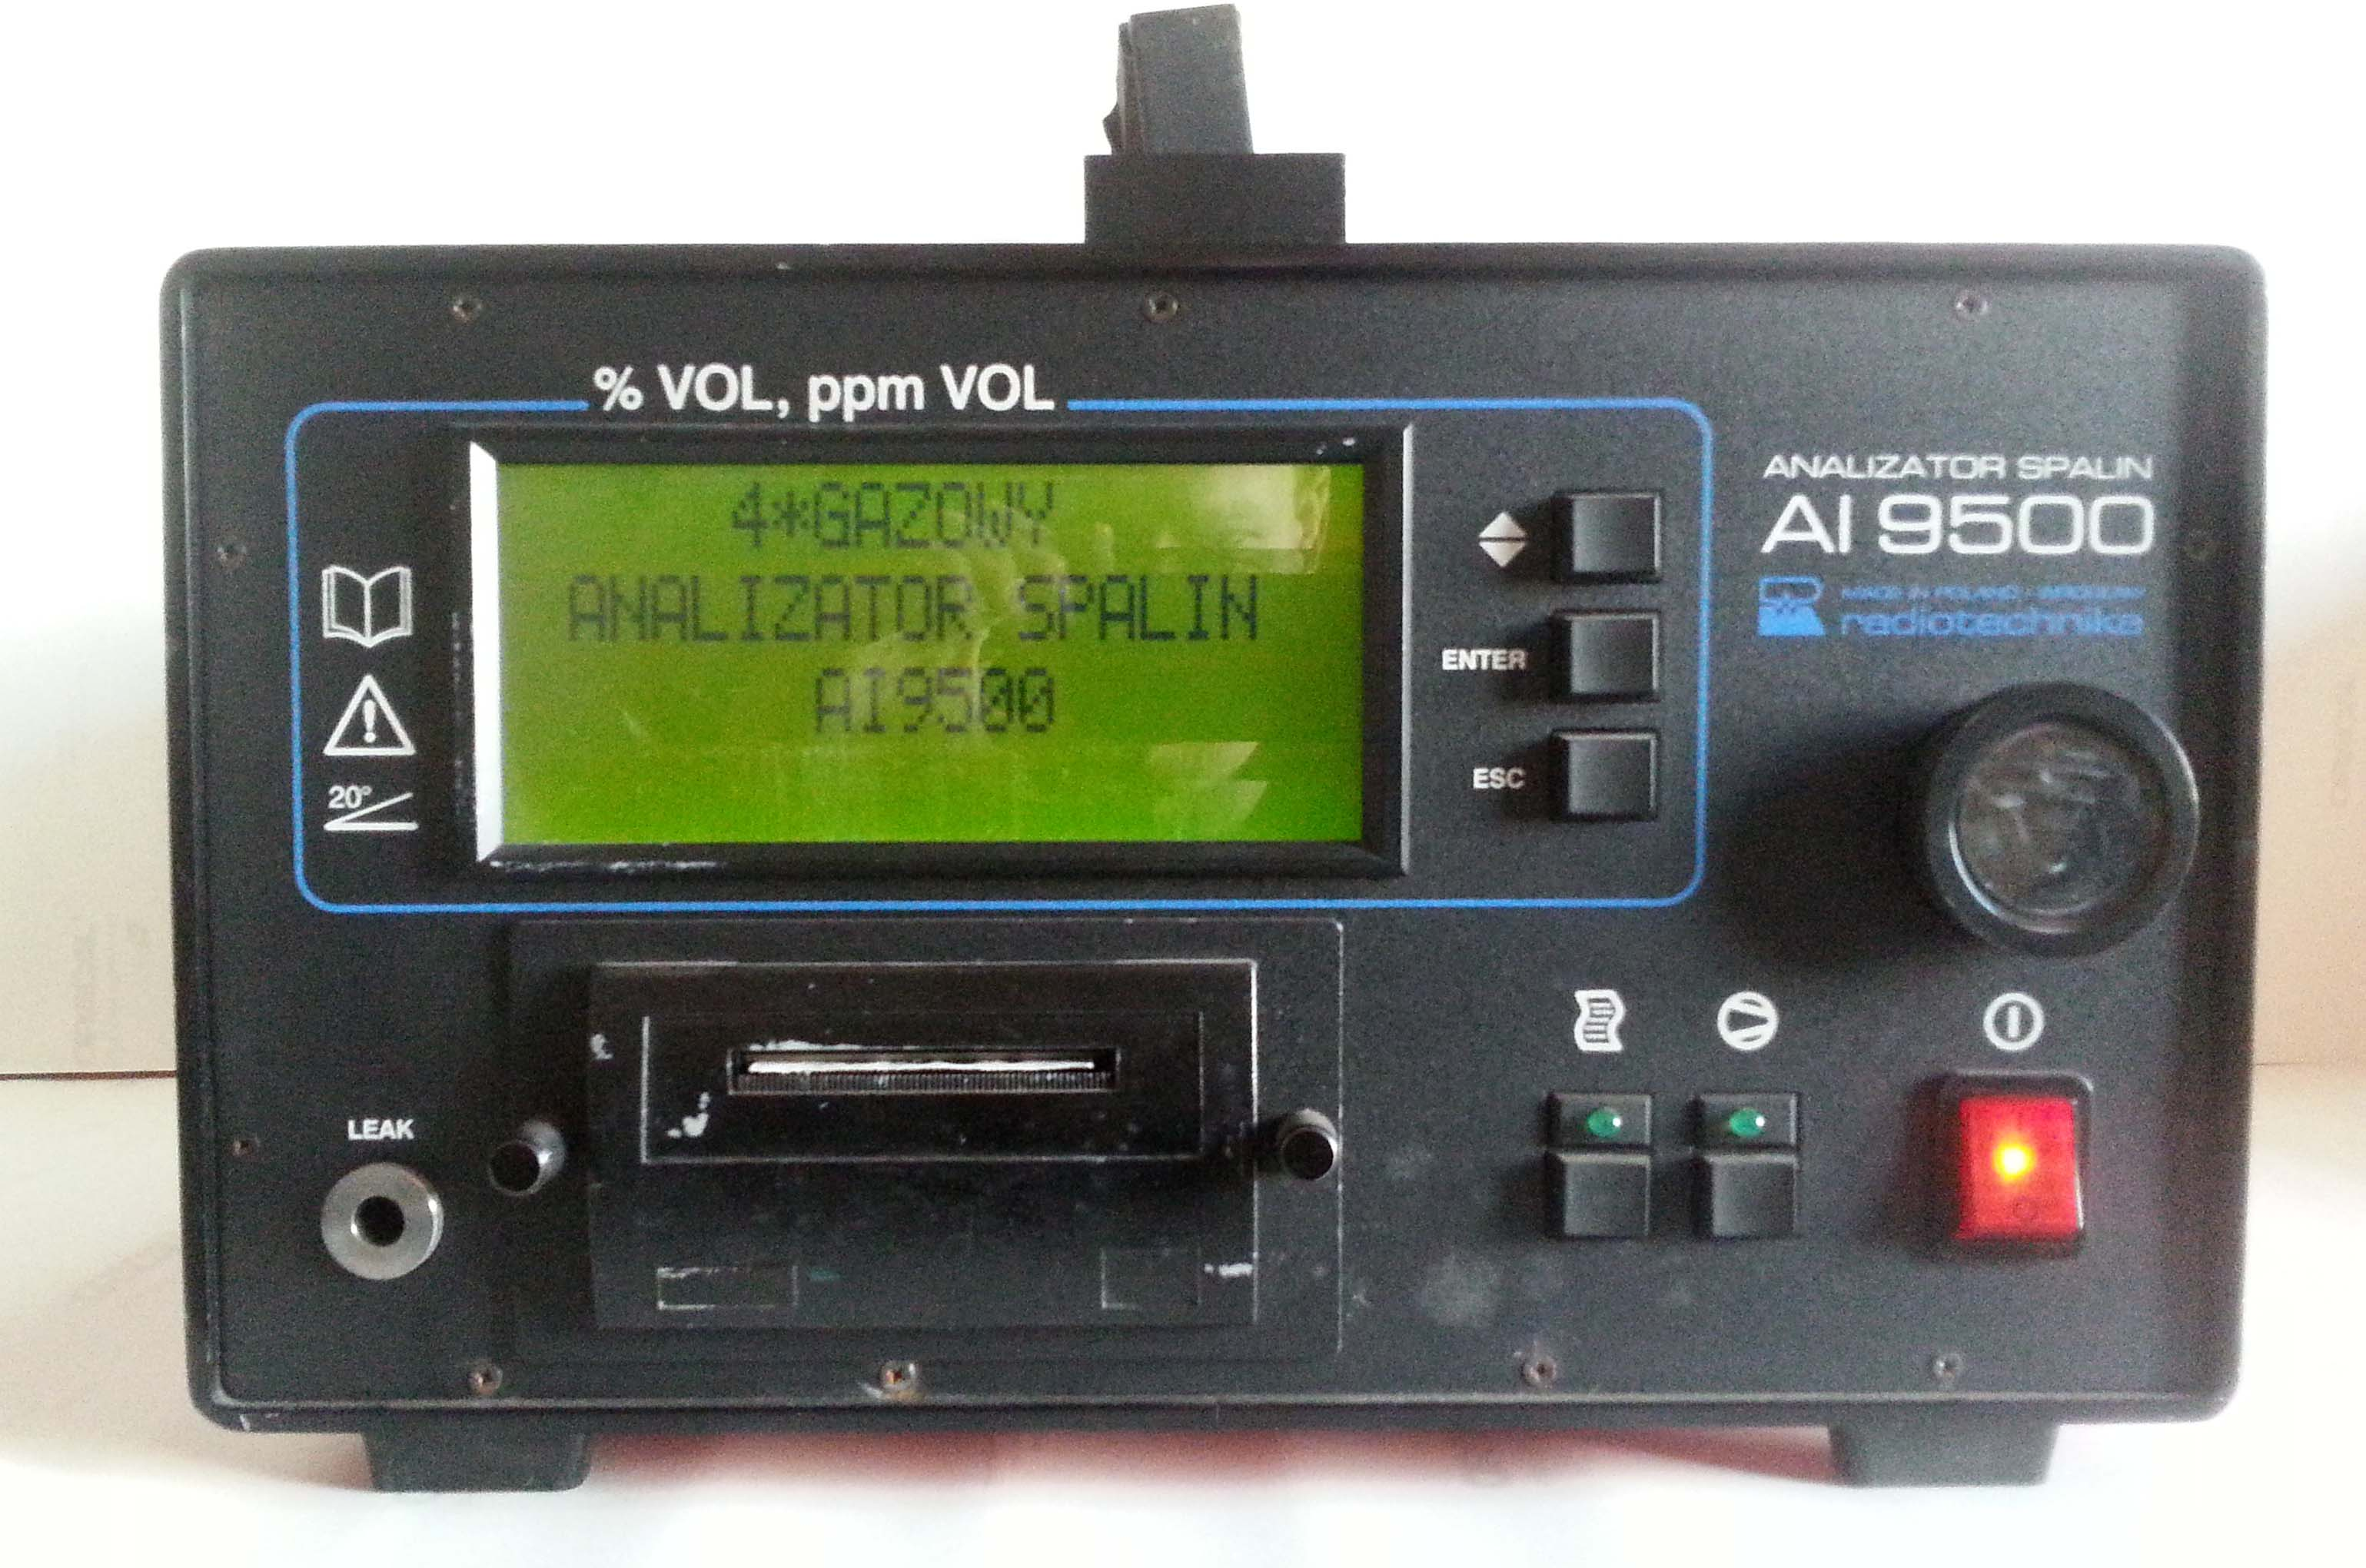 analizator spalin radiotechnika